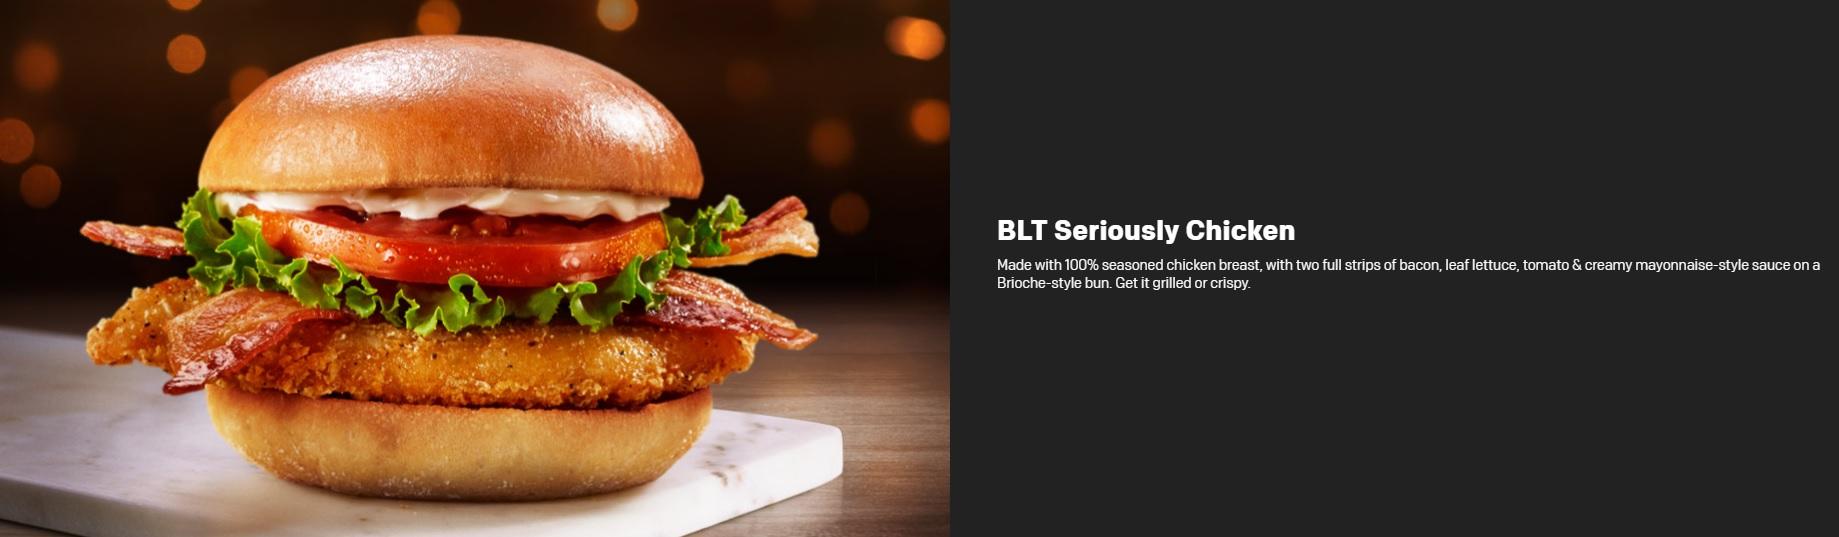 McDonald's Seriously Festive Menu - BLT Seriously Chicken